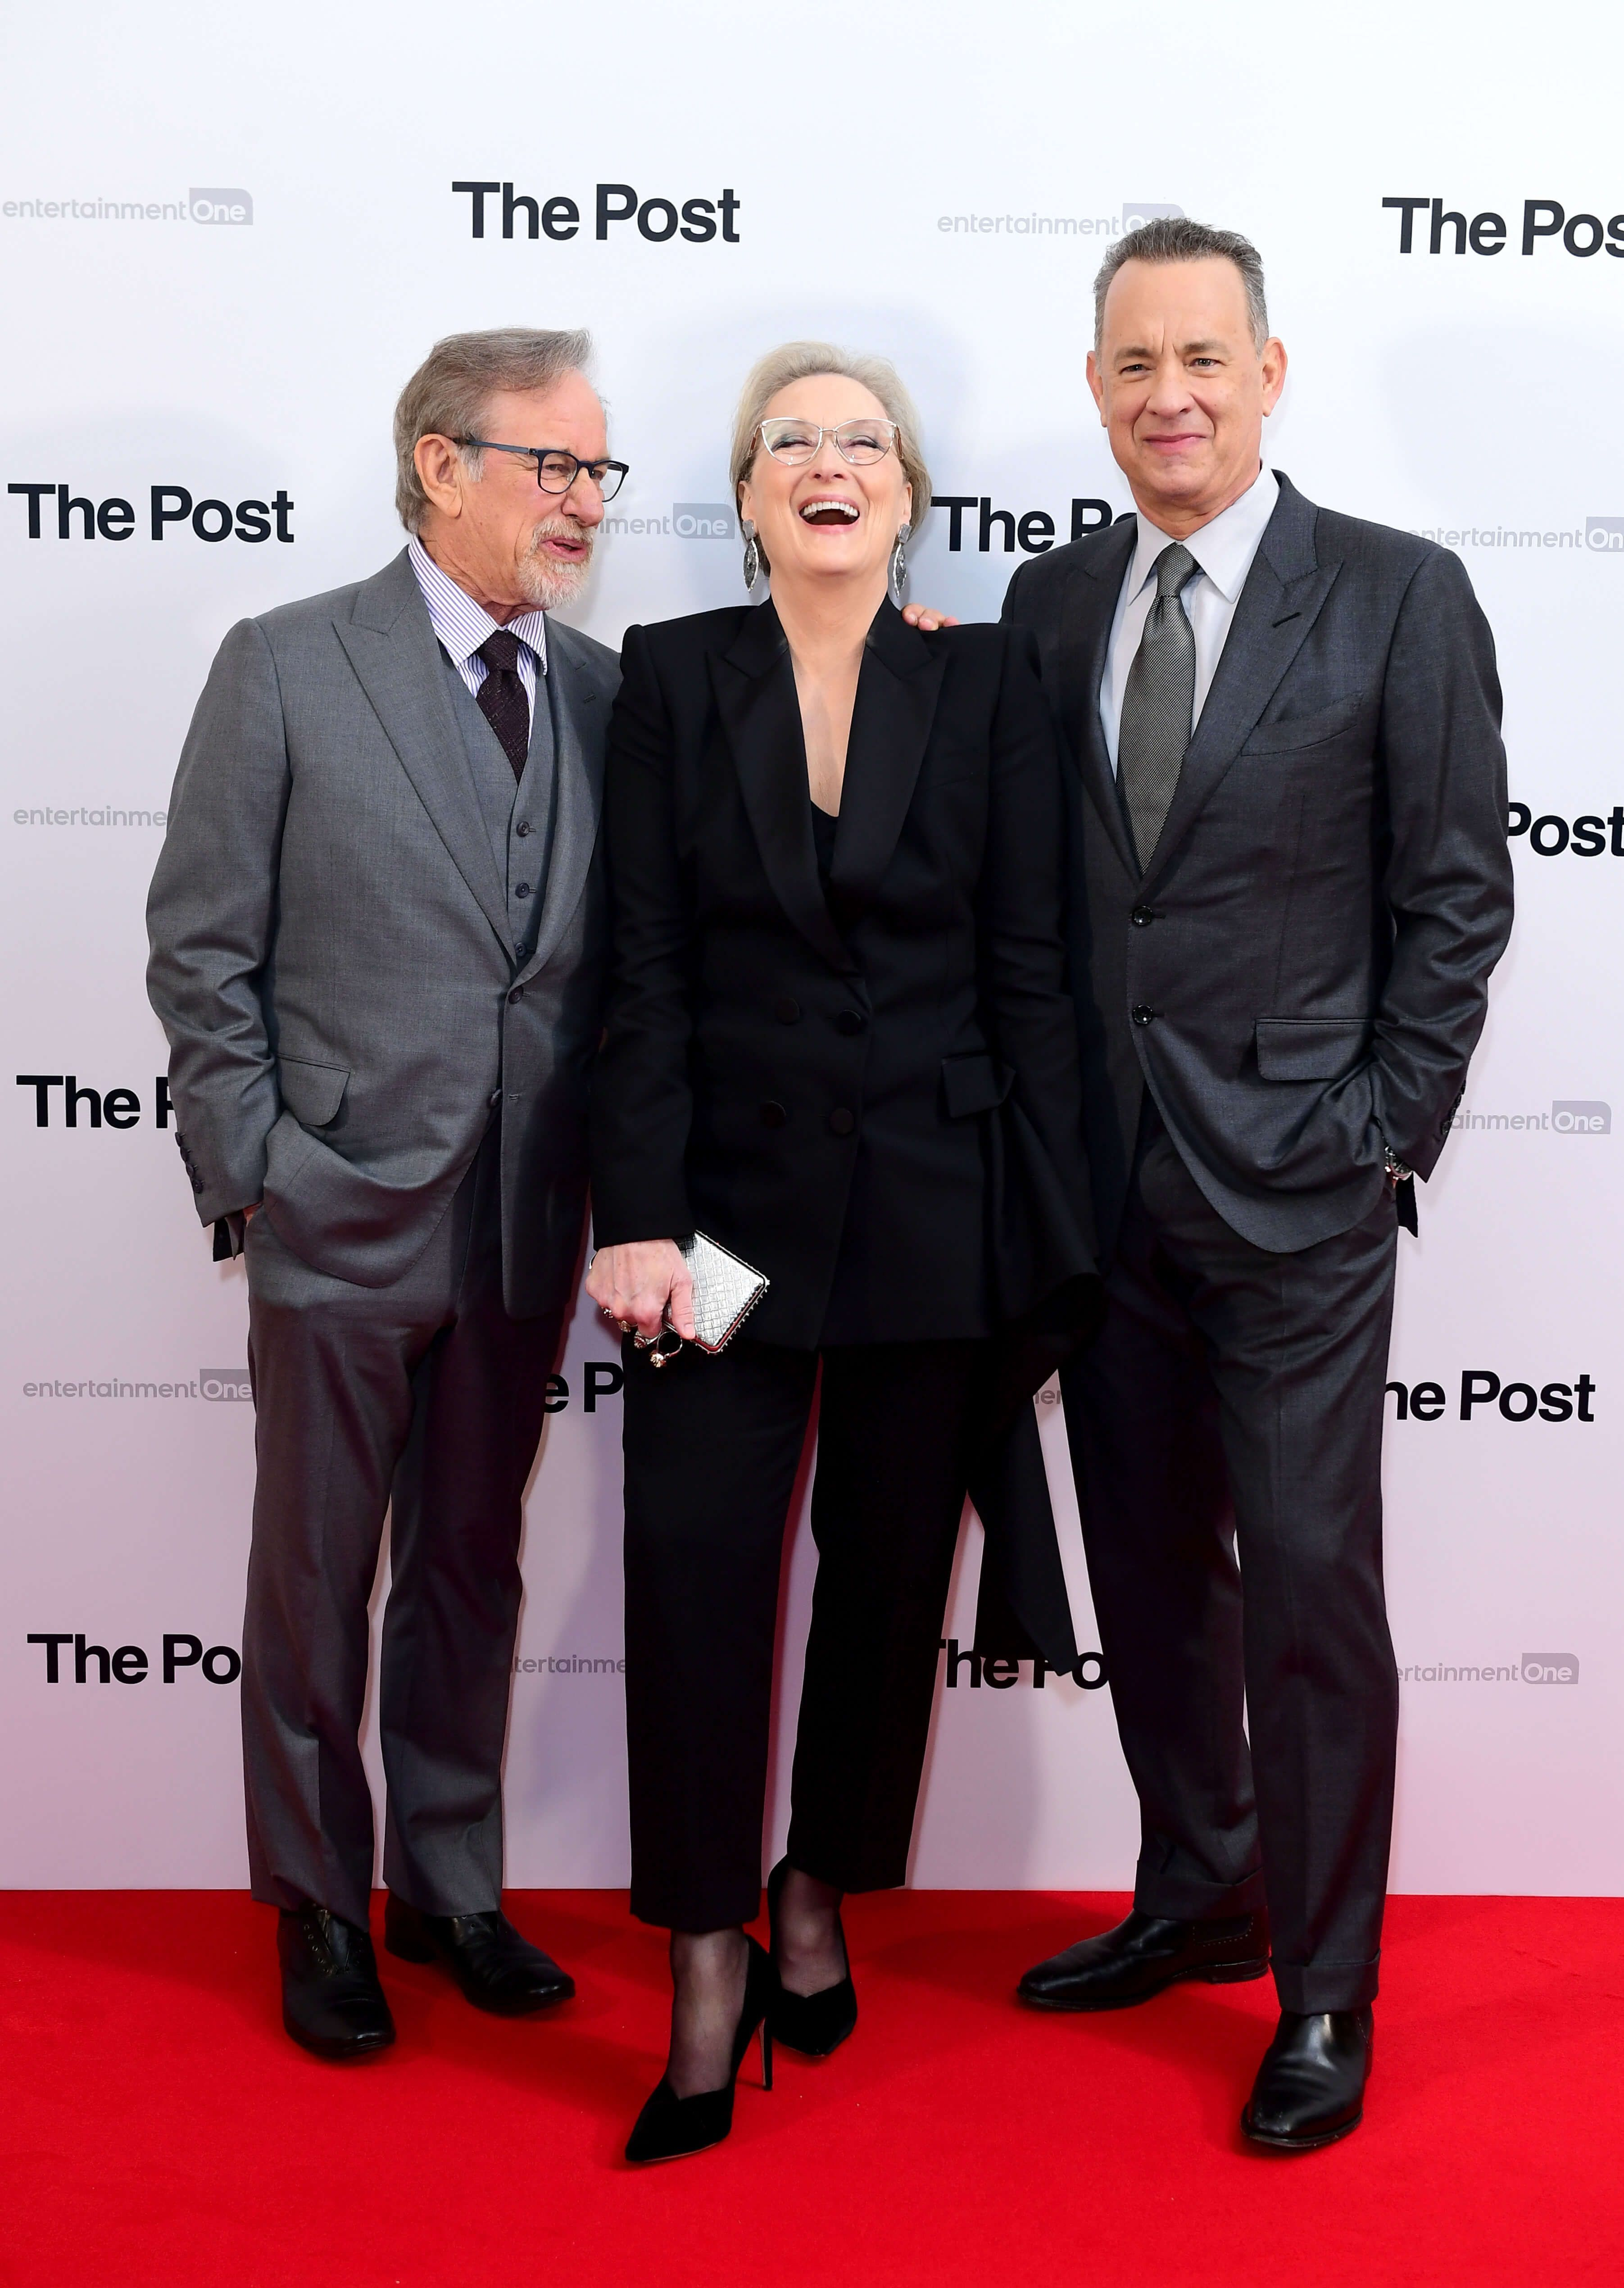 Steven Spielberg, Meryl Streep, Tom Hanks... l'équipe de rêve de Pentagon Papers